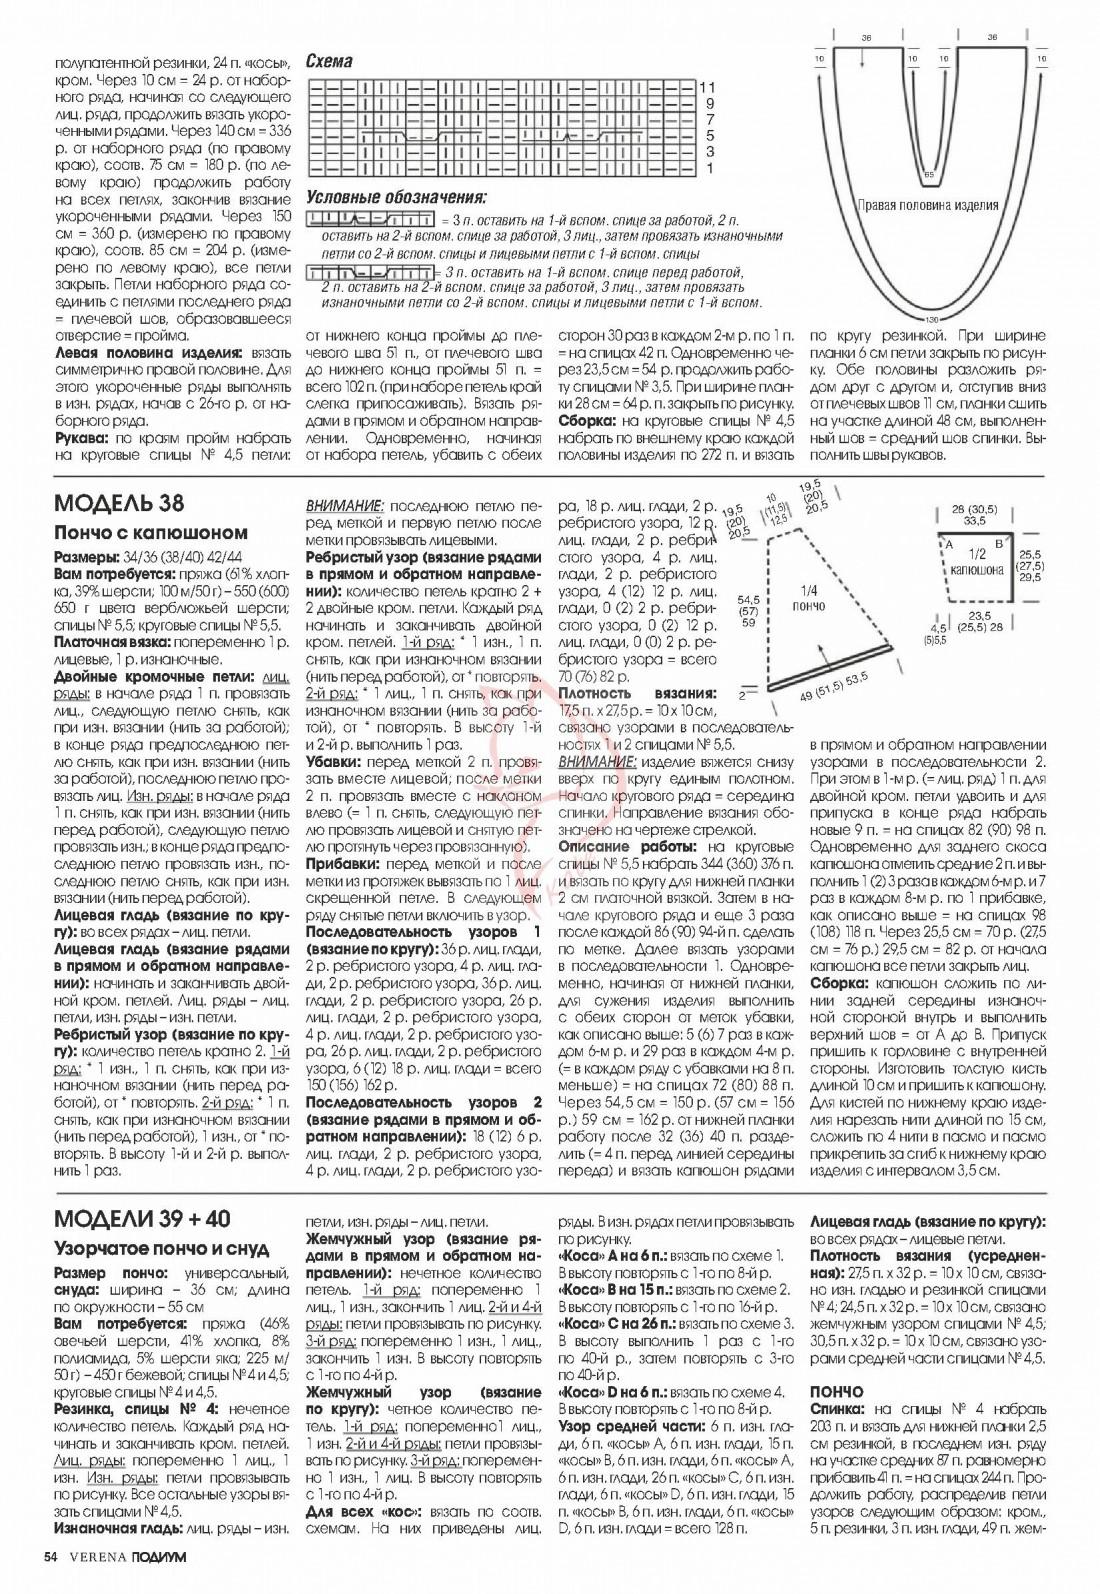 Page_00054b4515d91ce4a2160.jpg